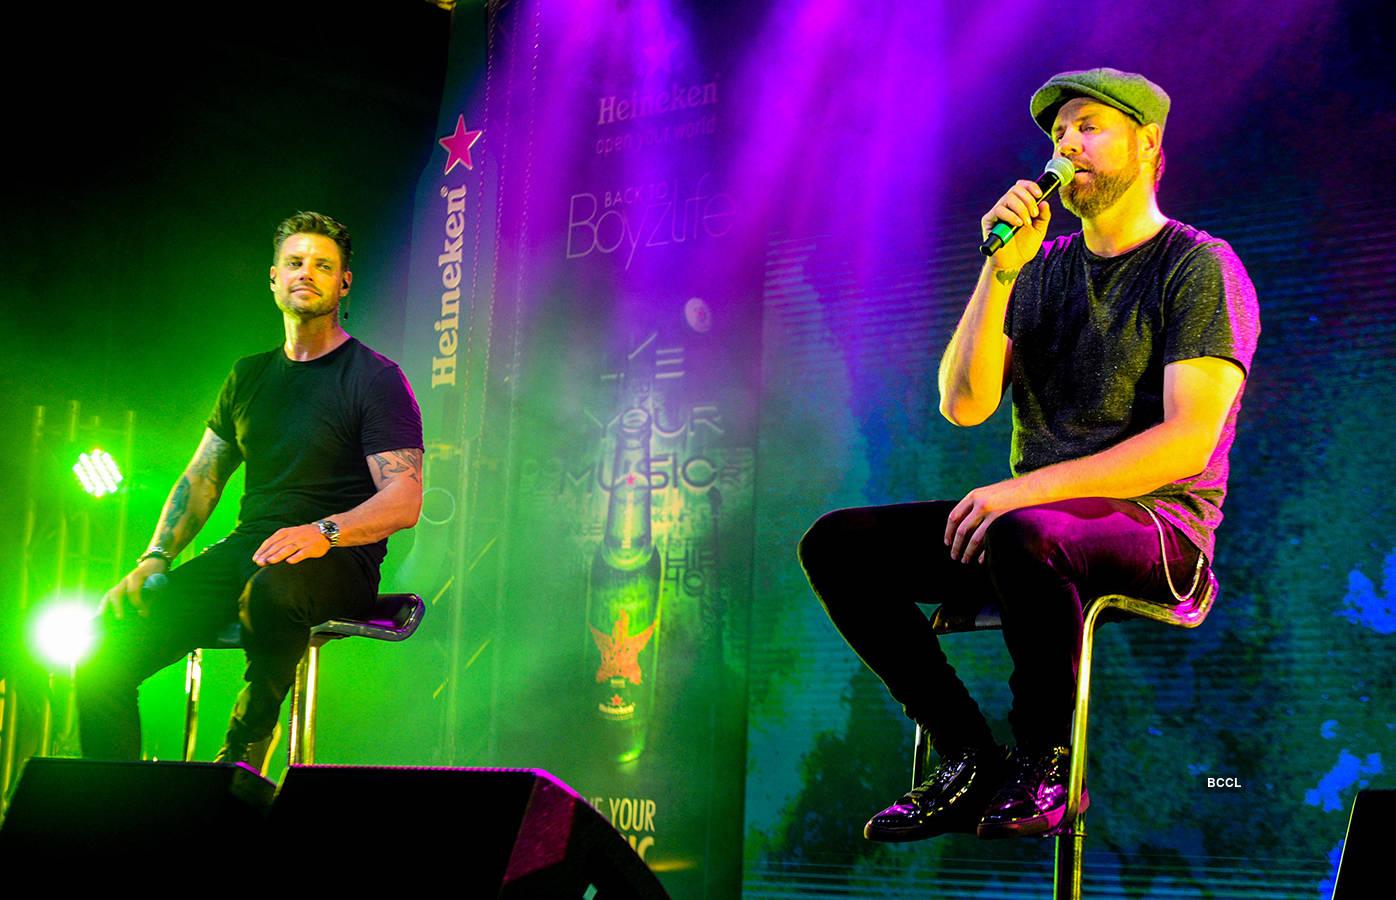 Boyzlife performs in Mumbai